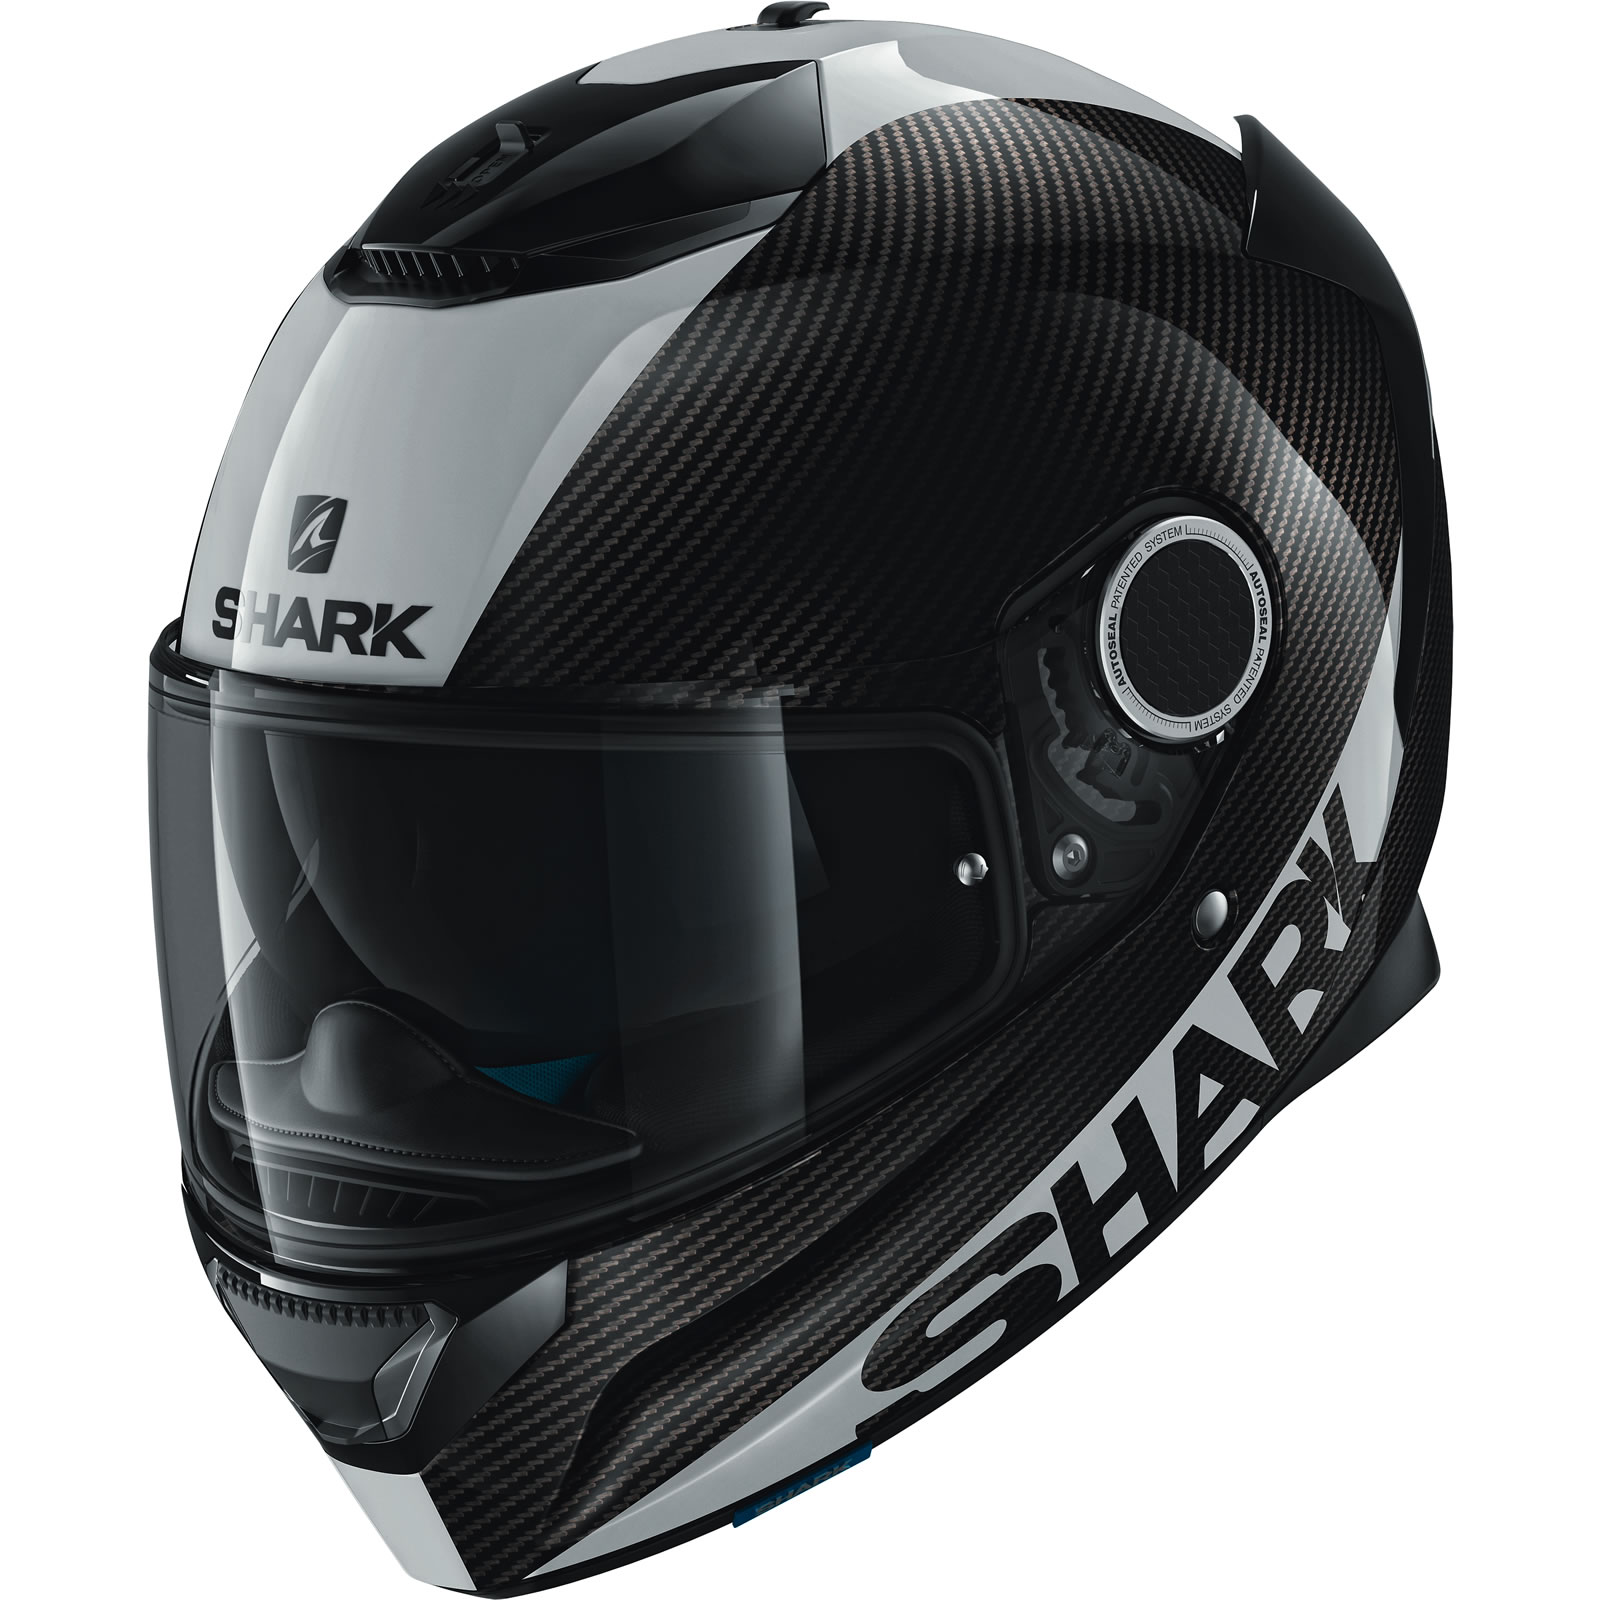 shark spartan carbon skin motorcycle helmet full face pinlock maxvision visor ebay. Black Bedroom Furniture Sets. Home Design Ideas